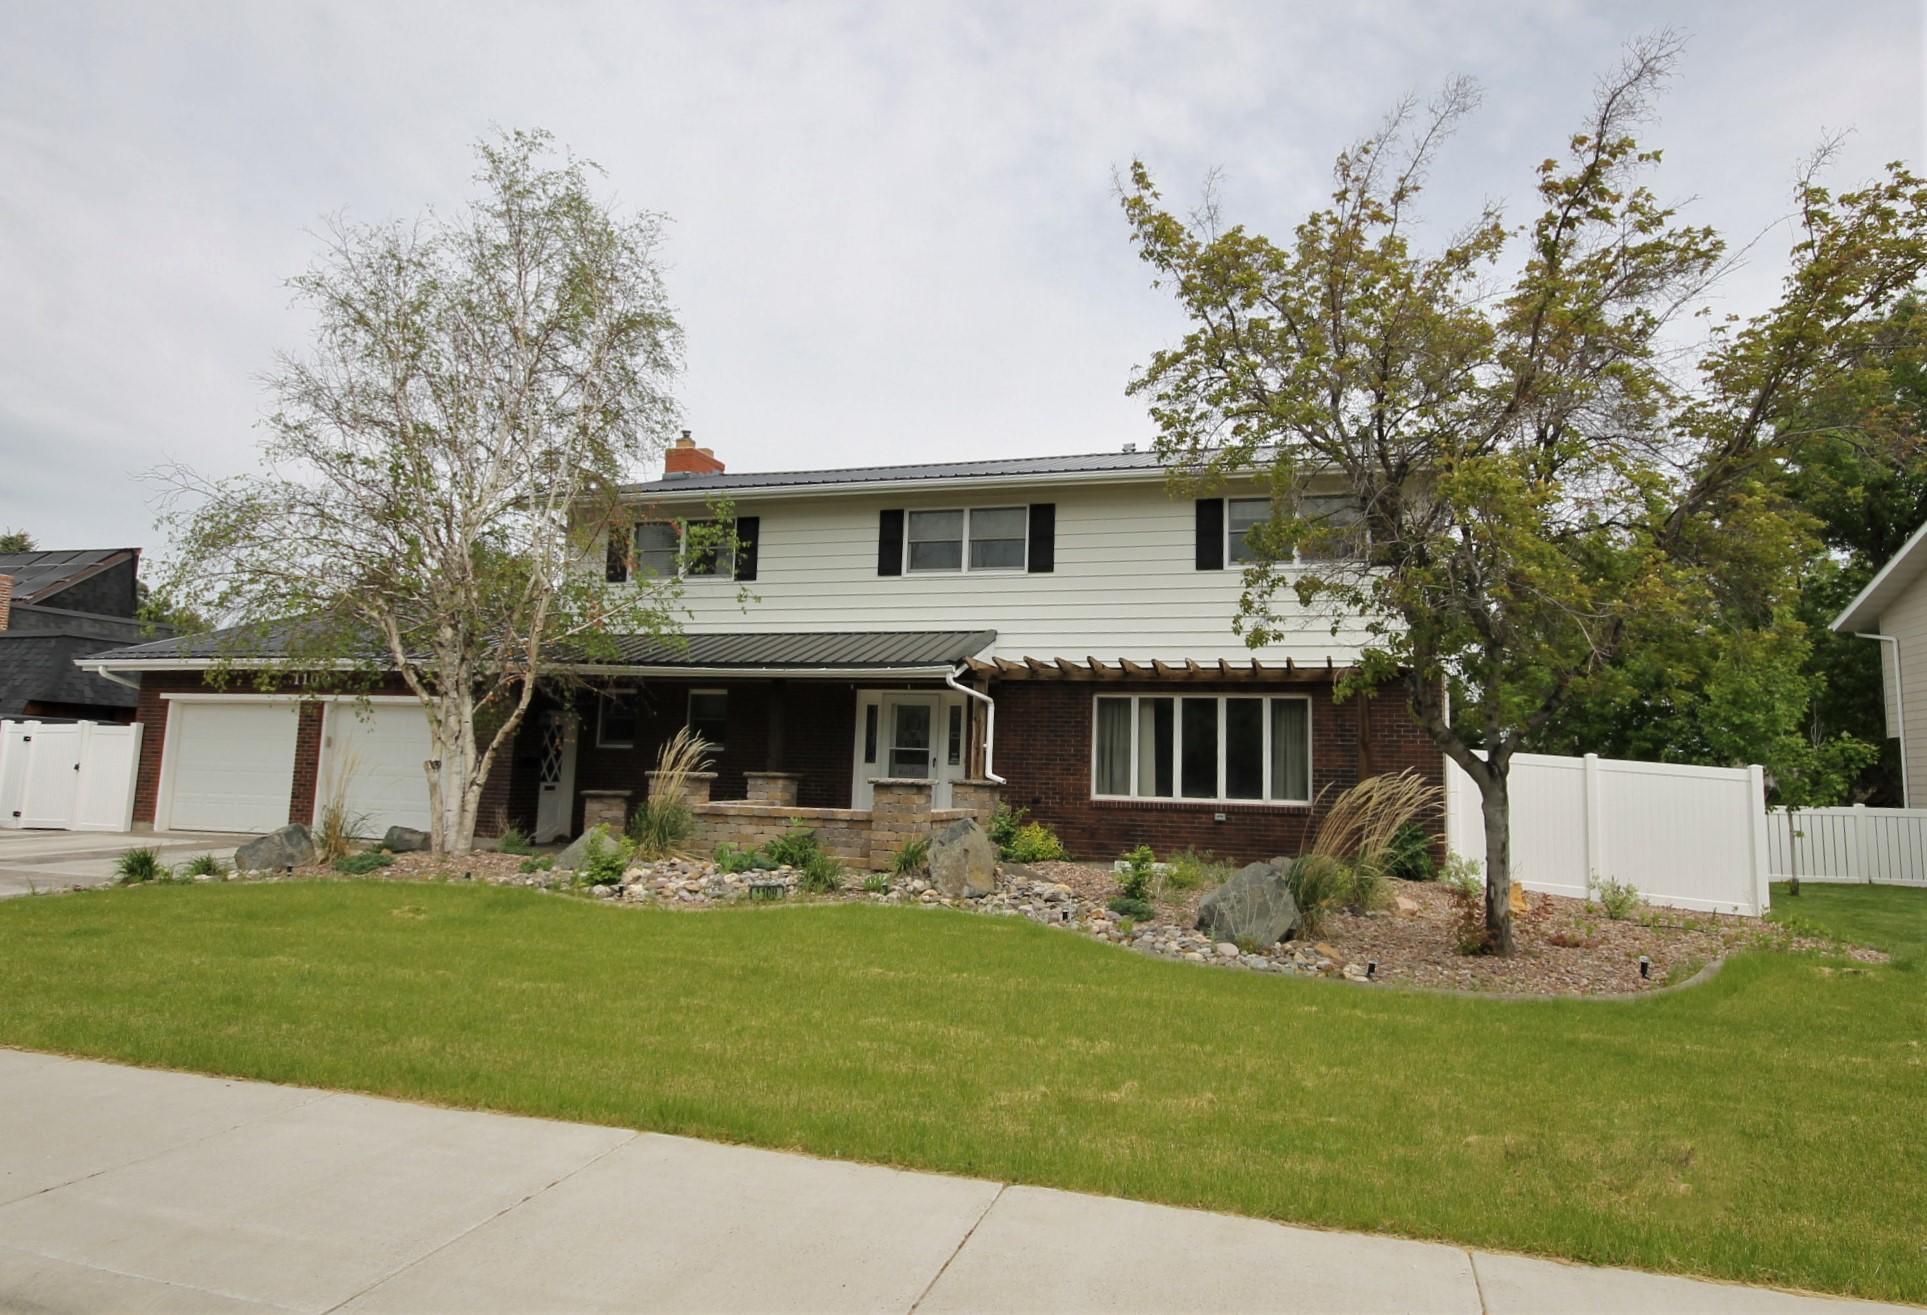 1109 19th Avenue S W, Great Falls, MT 59404